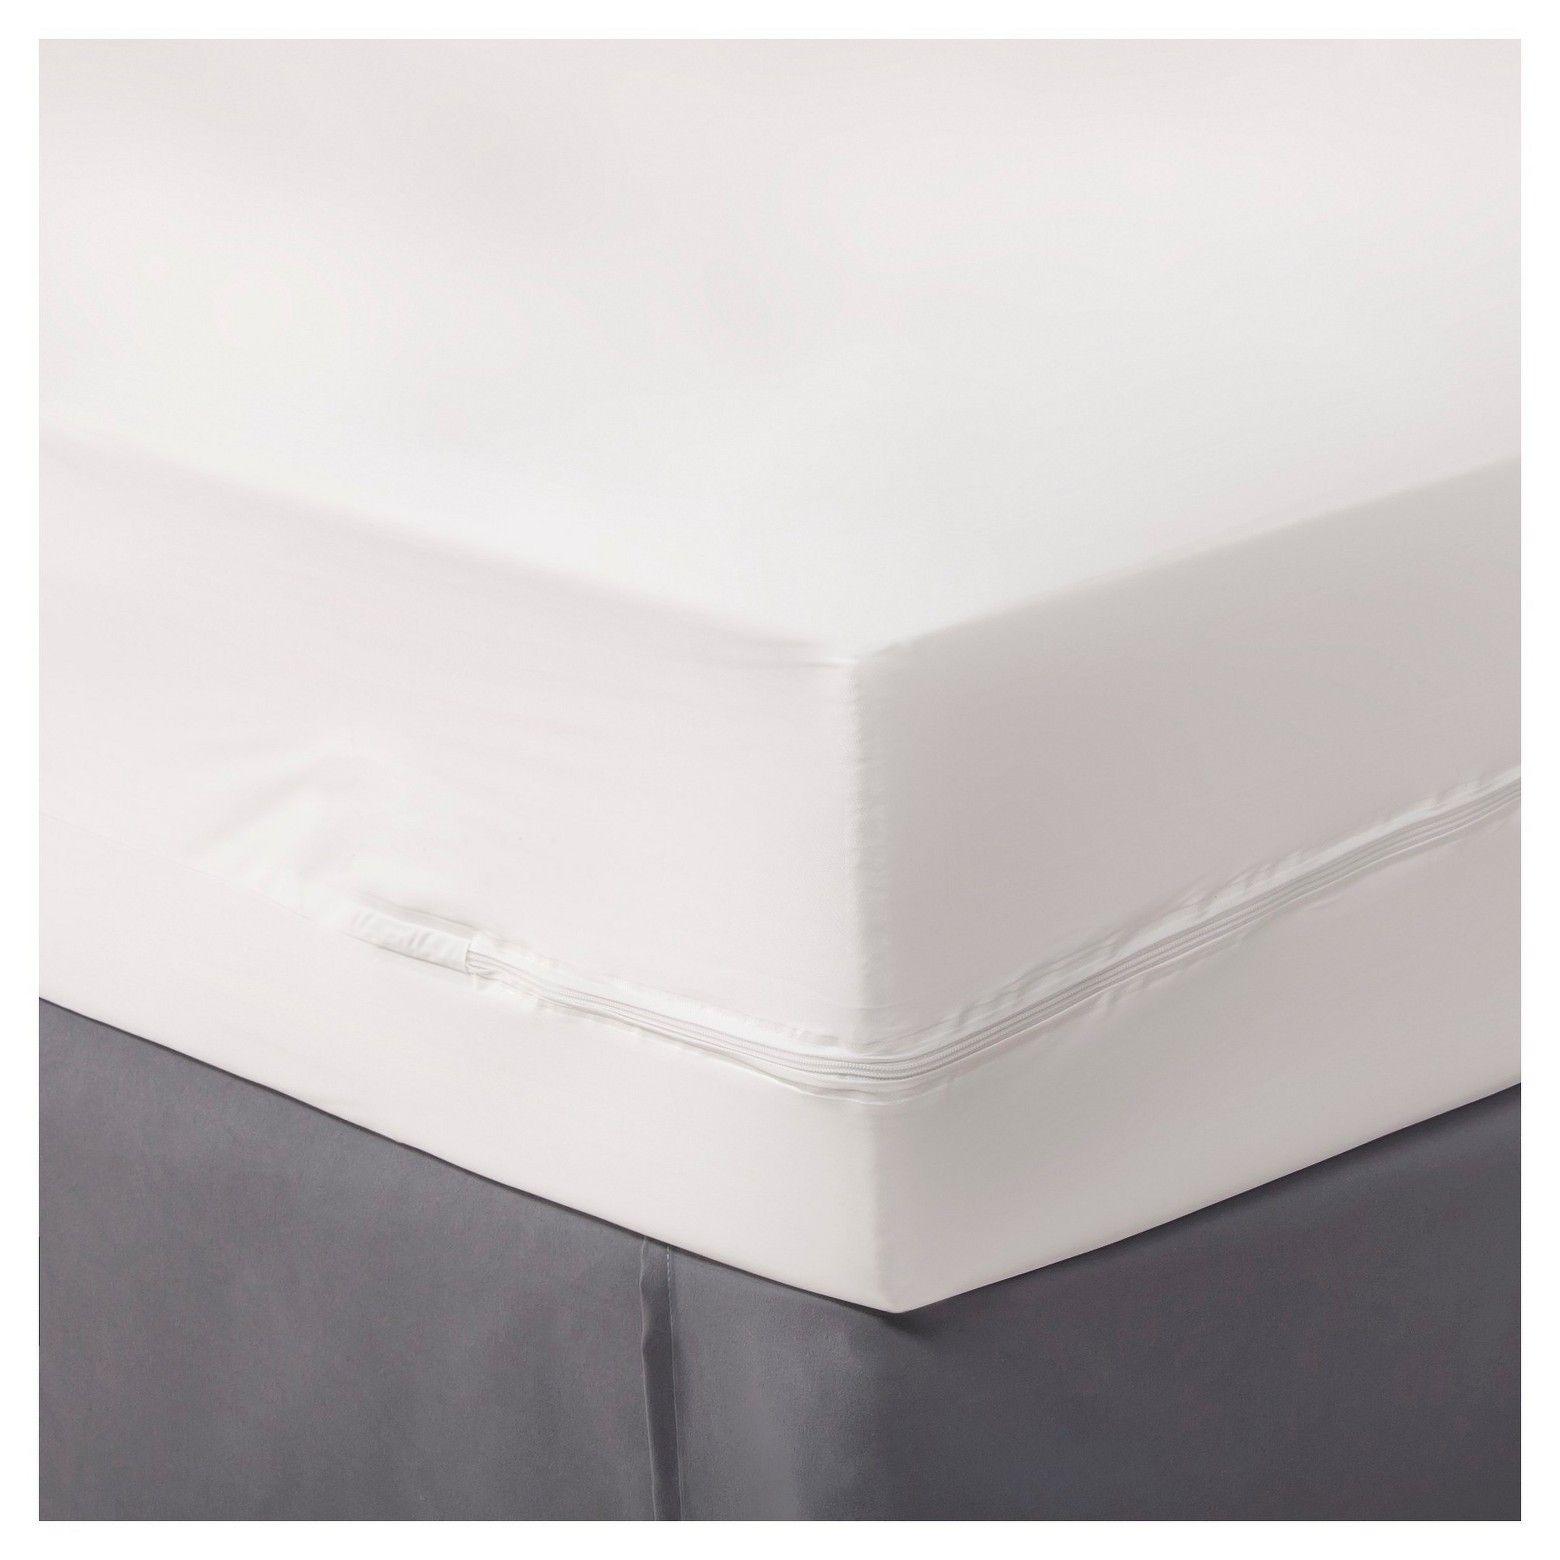 Zippered Mattress Protector White Queen Room Essentials Mattress Protector Waterproof Mattress Cover Room Essentials